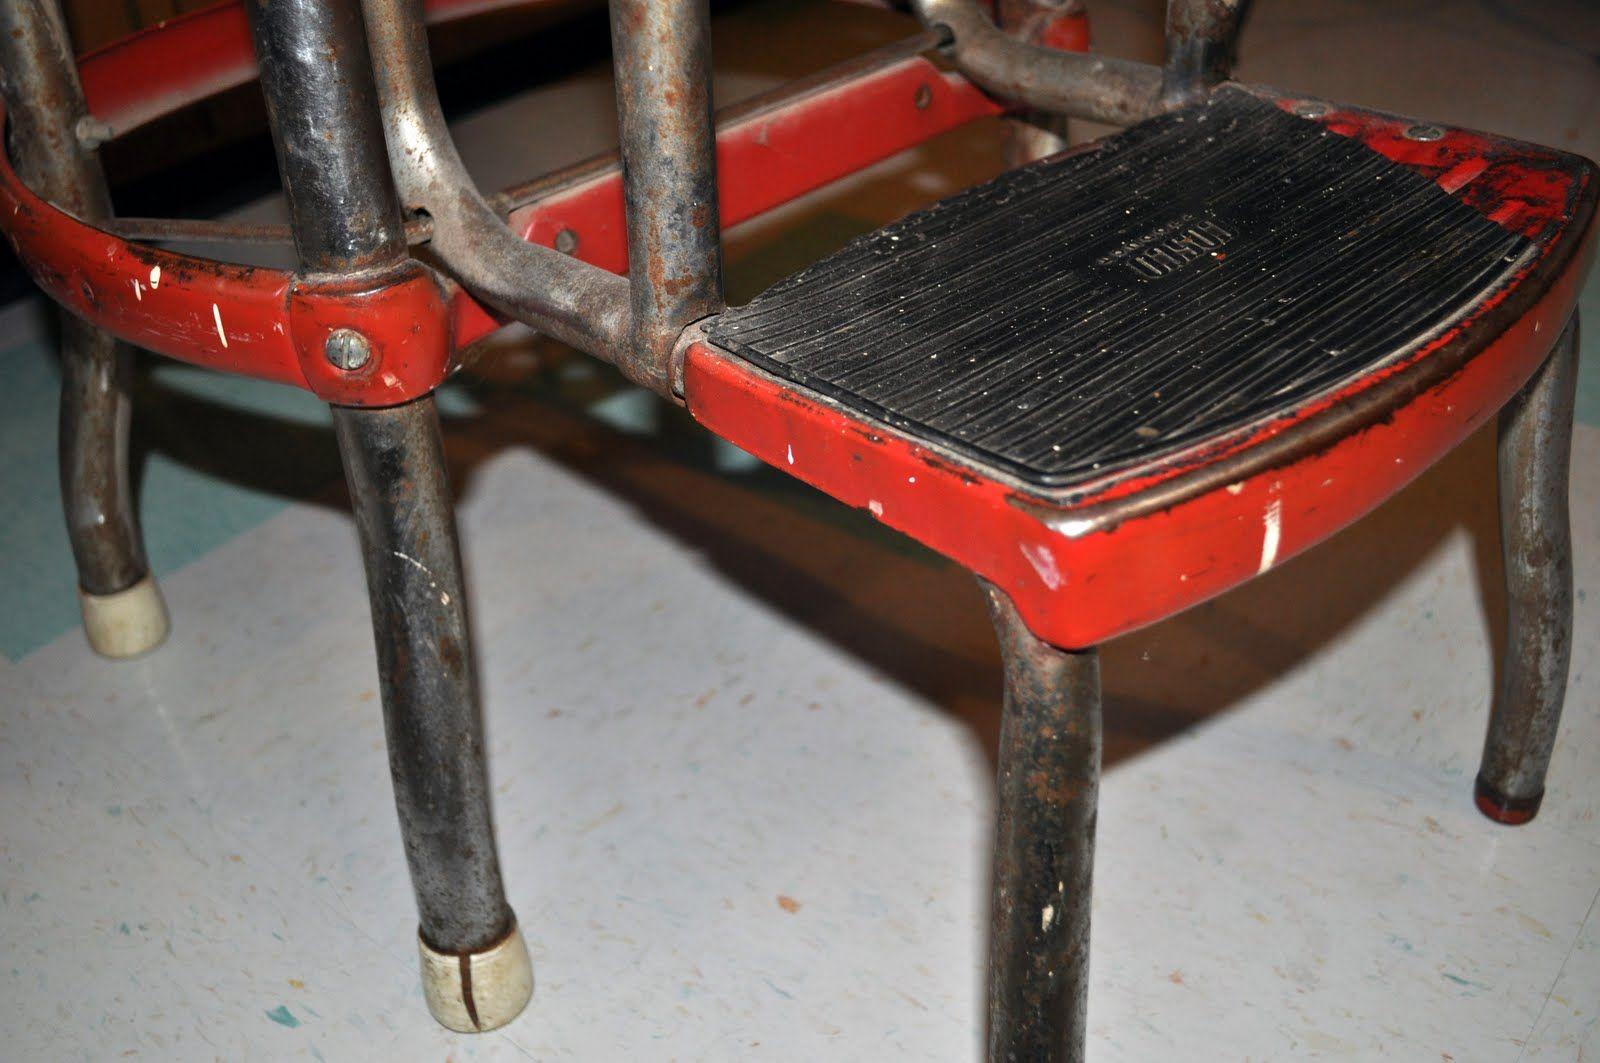 Remarkable Wedgwood Tulsa Vintage Cosco Stool Restore Cosco Step Inzonedesignstudio Interior Chair Design Inzonedesignstudiocom